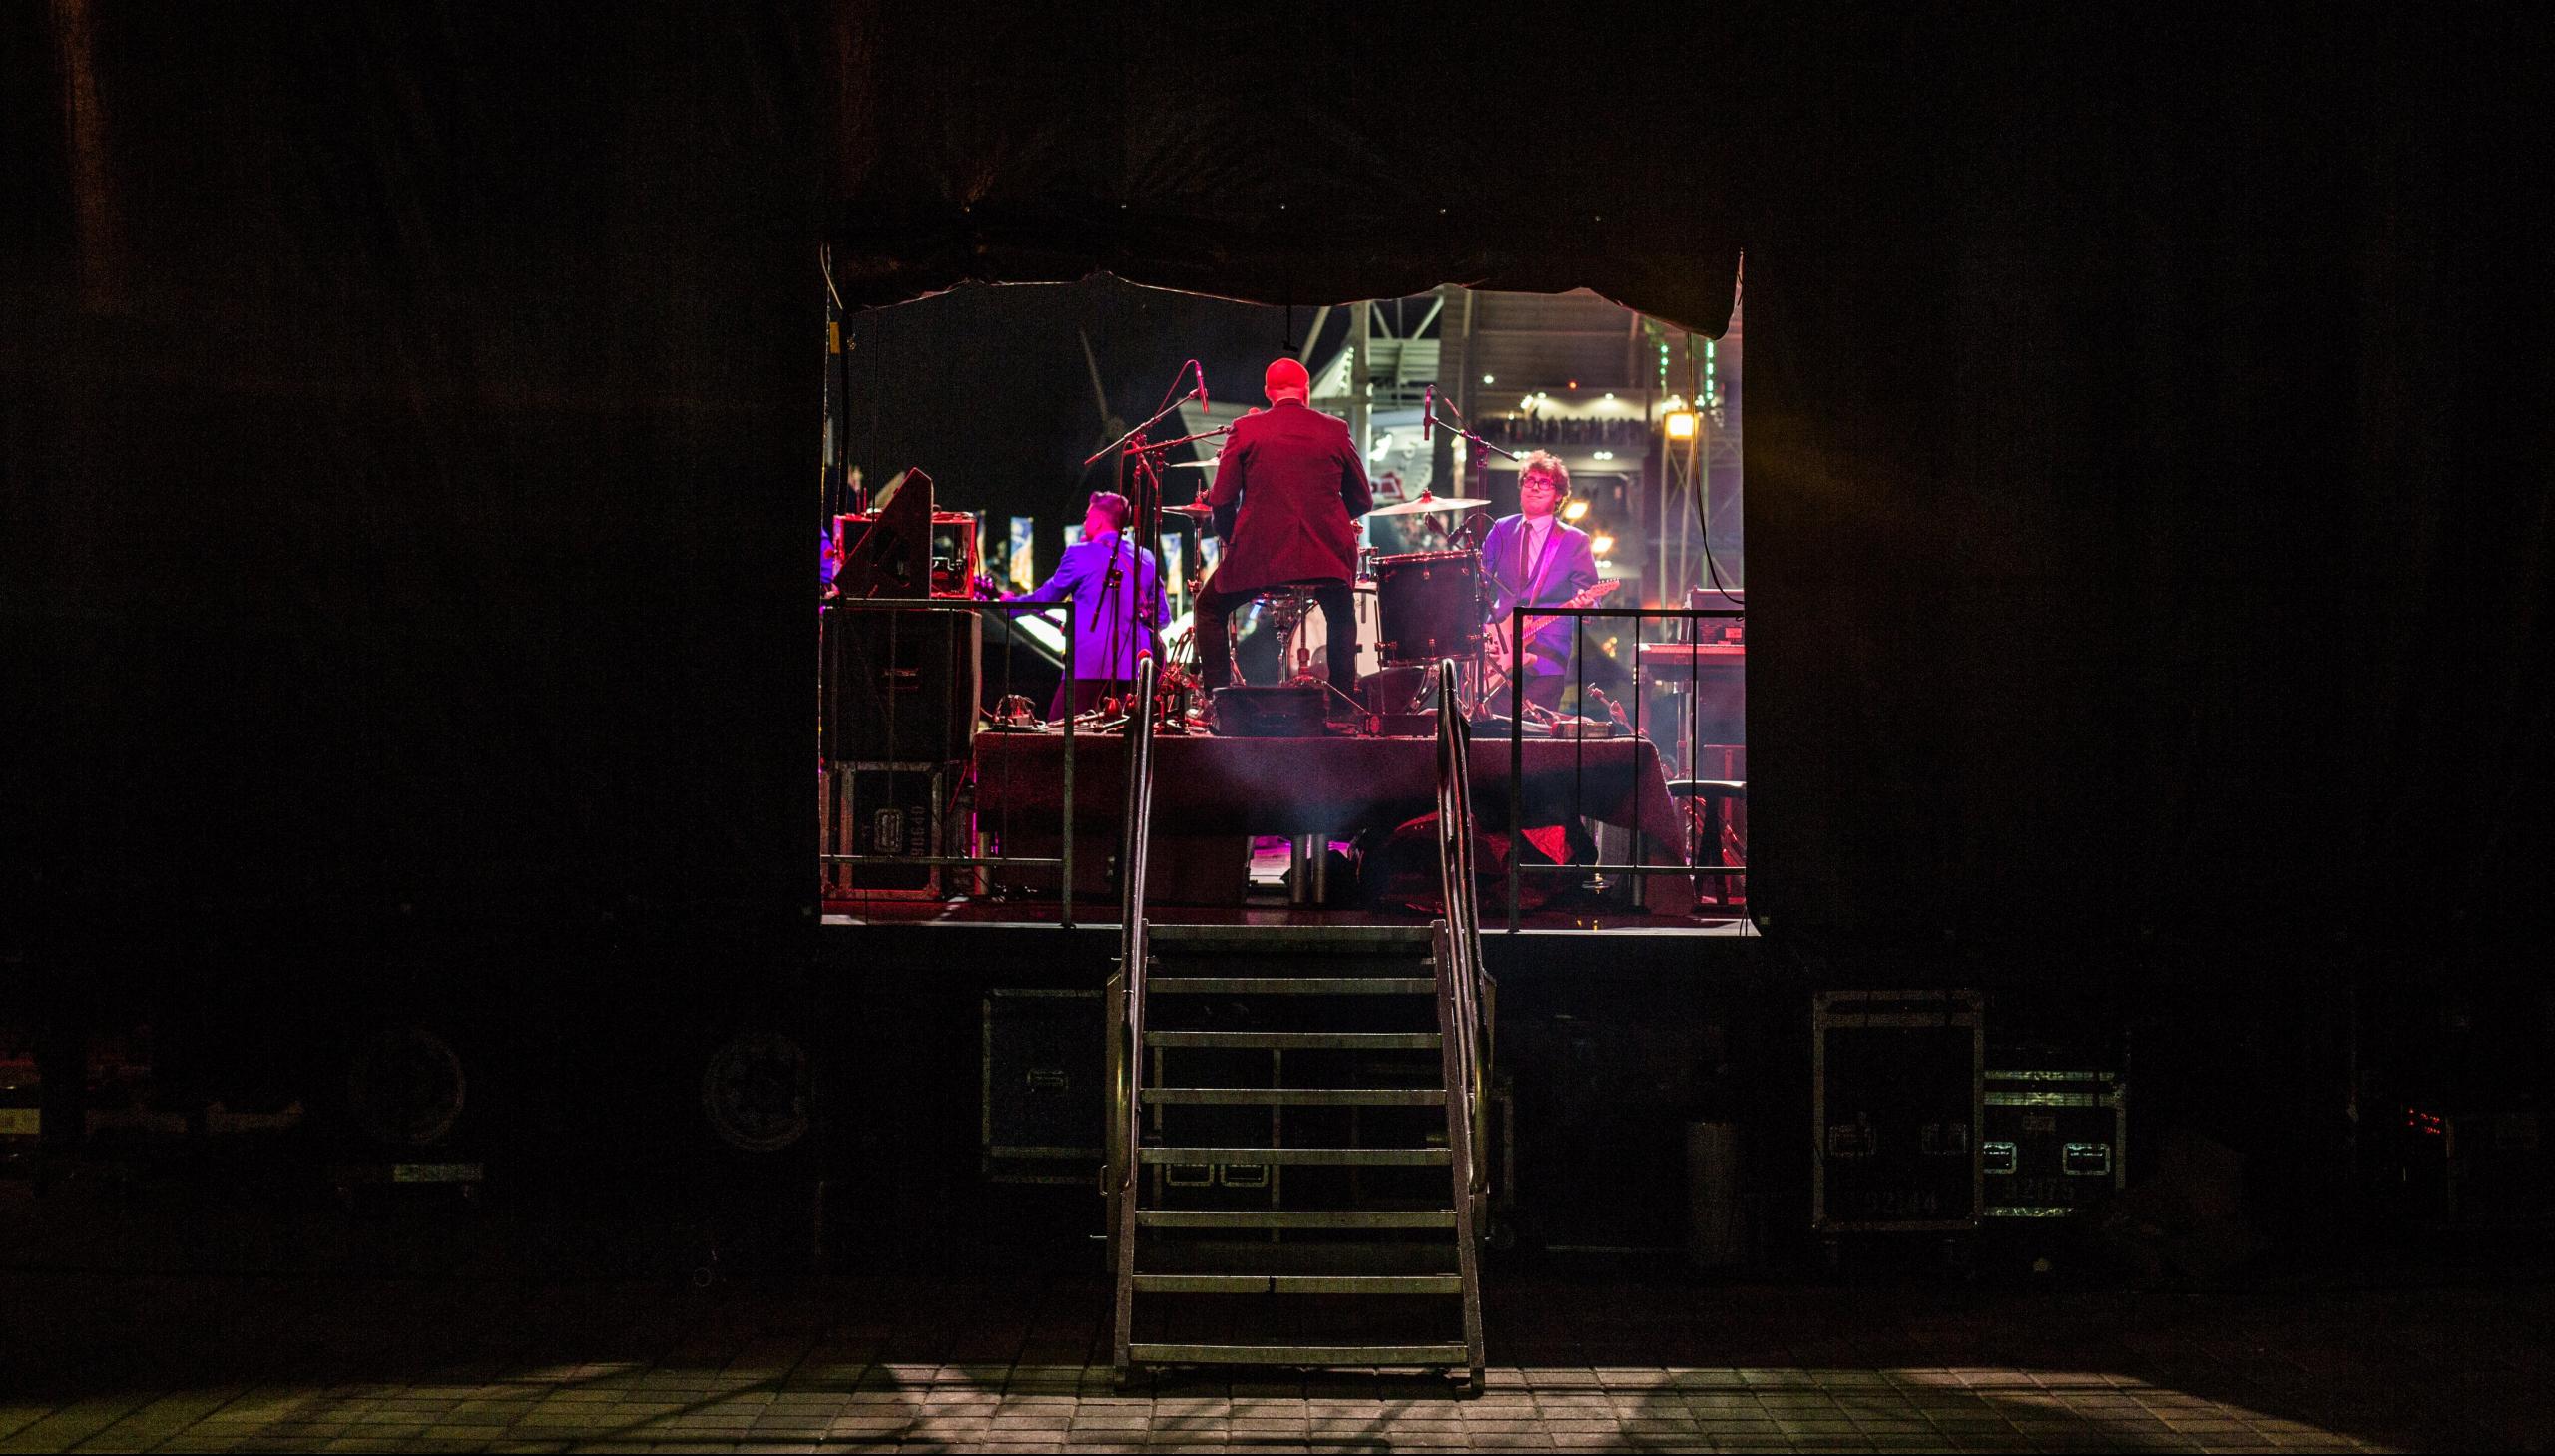 Justin became a pole dancer during Machine Gun Kelly's 'Riot Fest' set